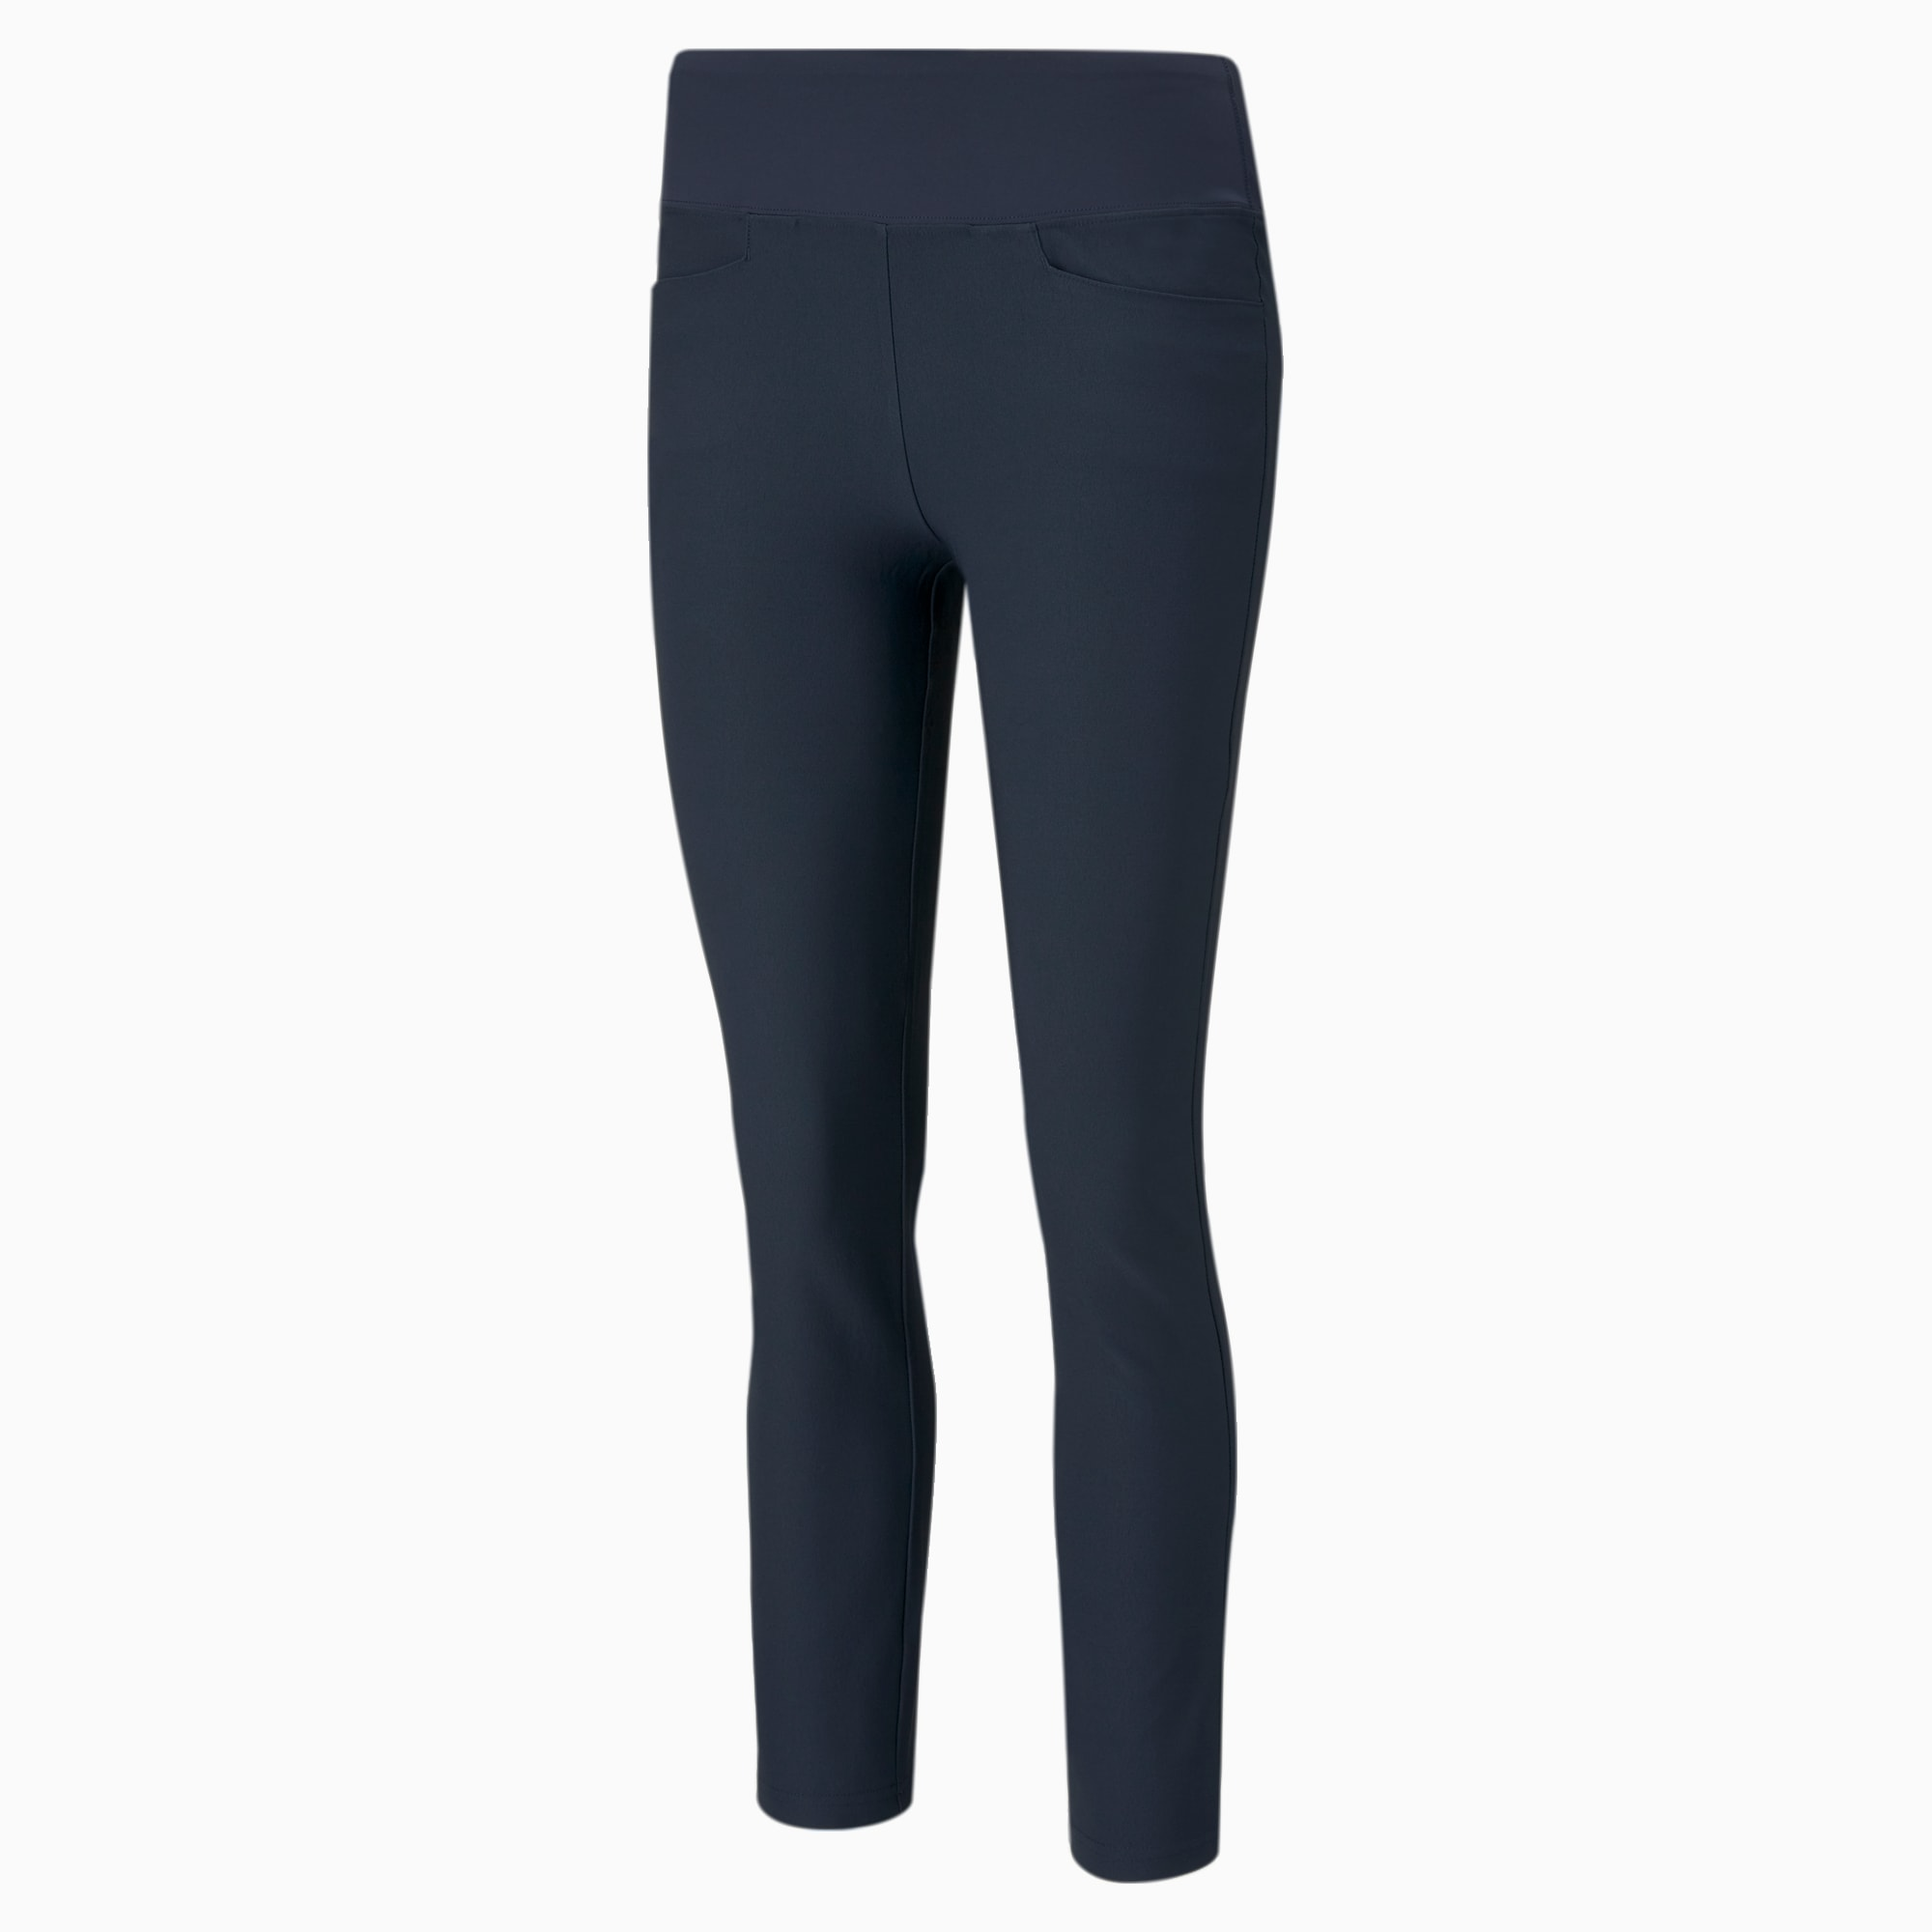 Pantalon de golf PWRSHAPE, Bleu, Taille L, Vêtements - PUMA - Modalova